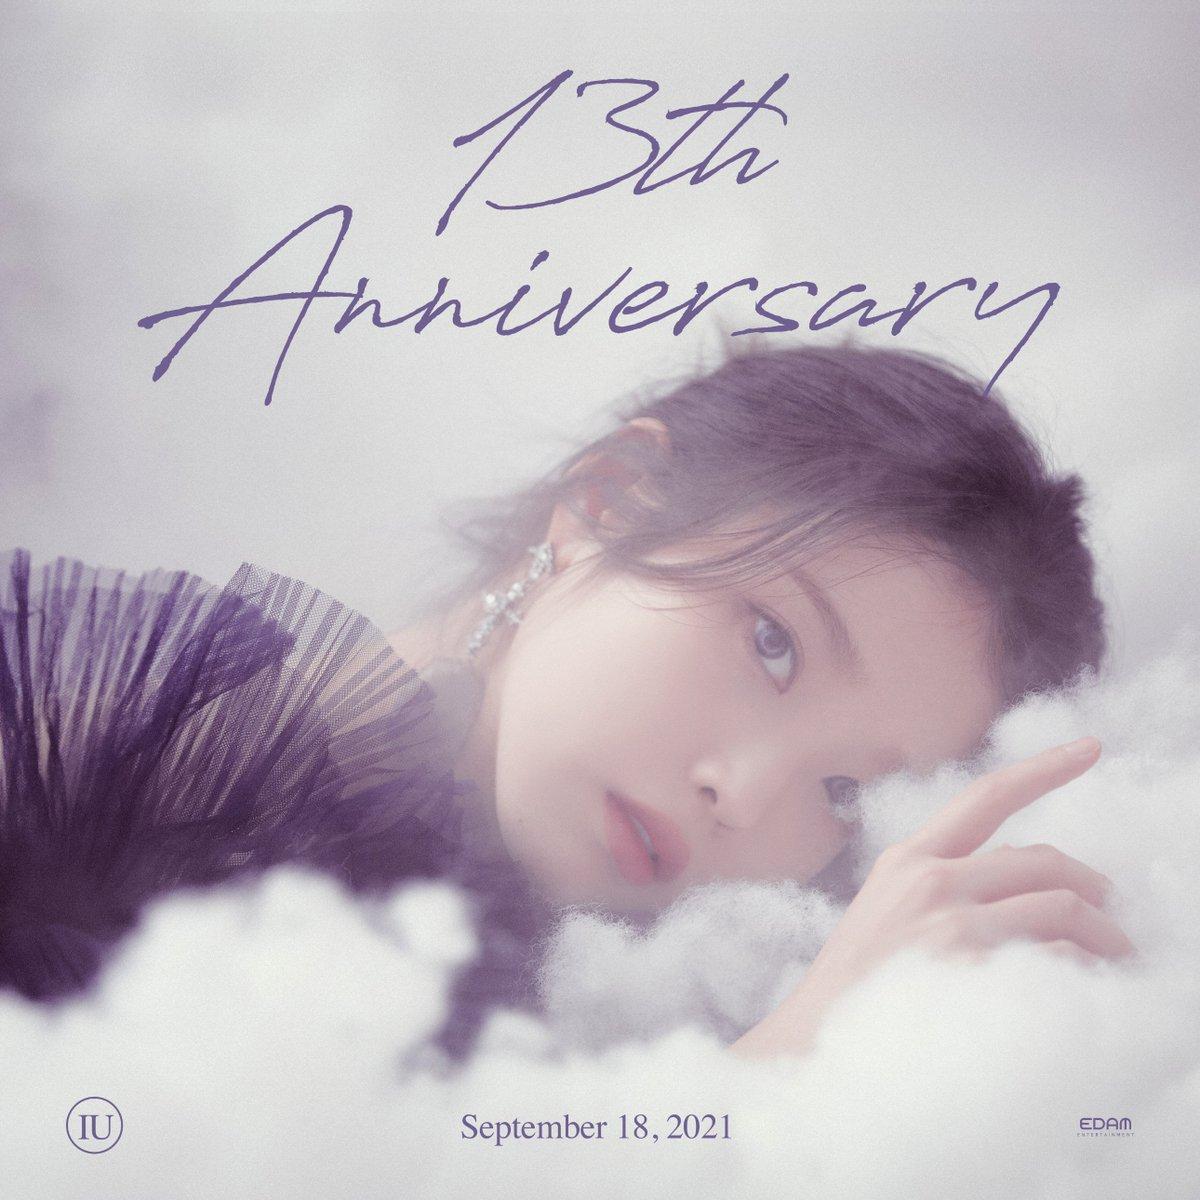 HAPPY IU 13th Anniversary🎉  #IU #아이유 #IU_13th_Anniversary #IU_13th_UAENA #13YearsWithIU #IUwithUAENA #유애나는_13년째_그렇다